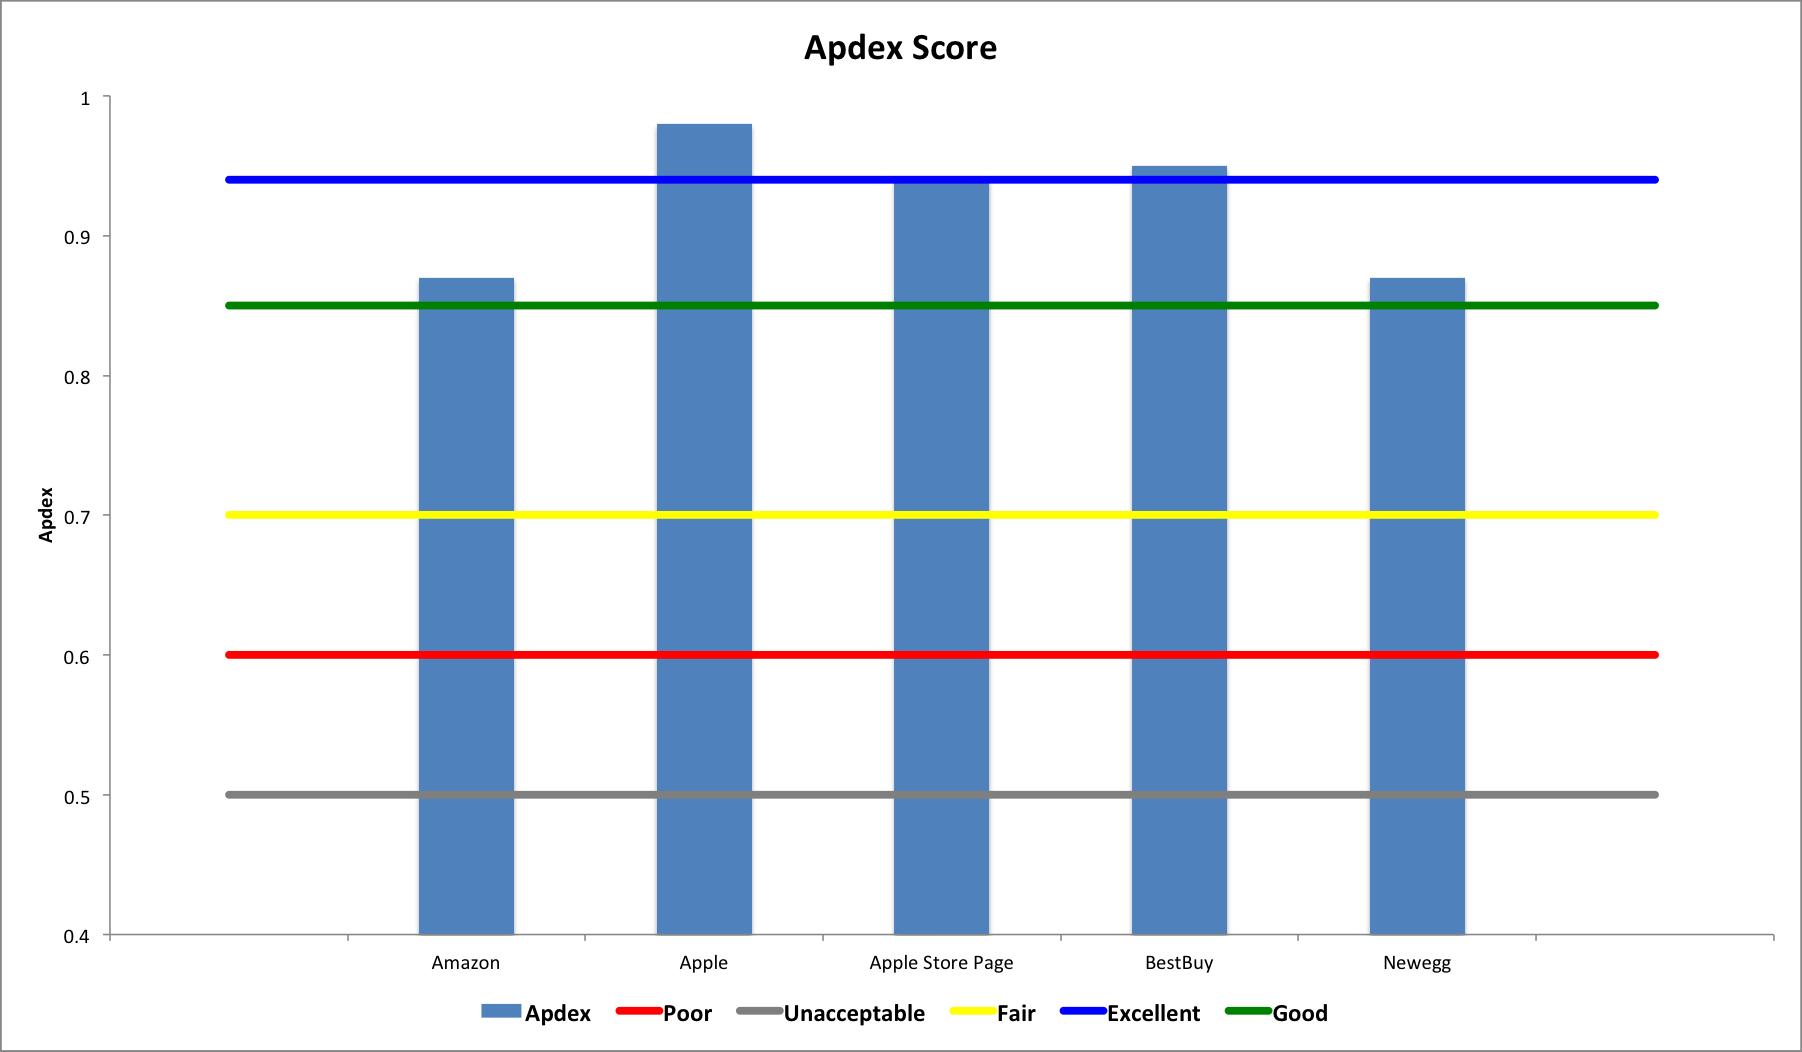 Ecommerce Benchmark: Apdex Score for Apple, Apple Store, NewEgg, BestBuy and Amazon